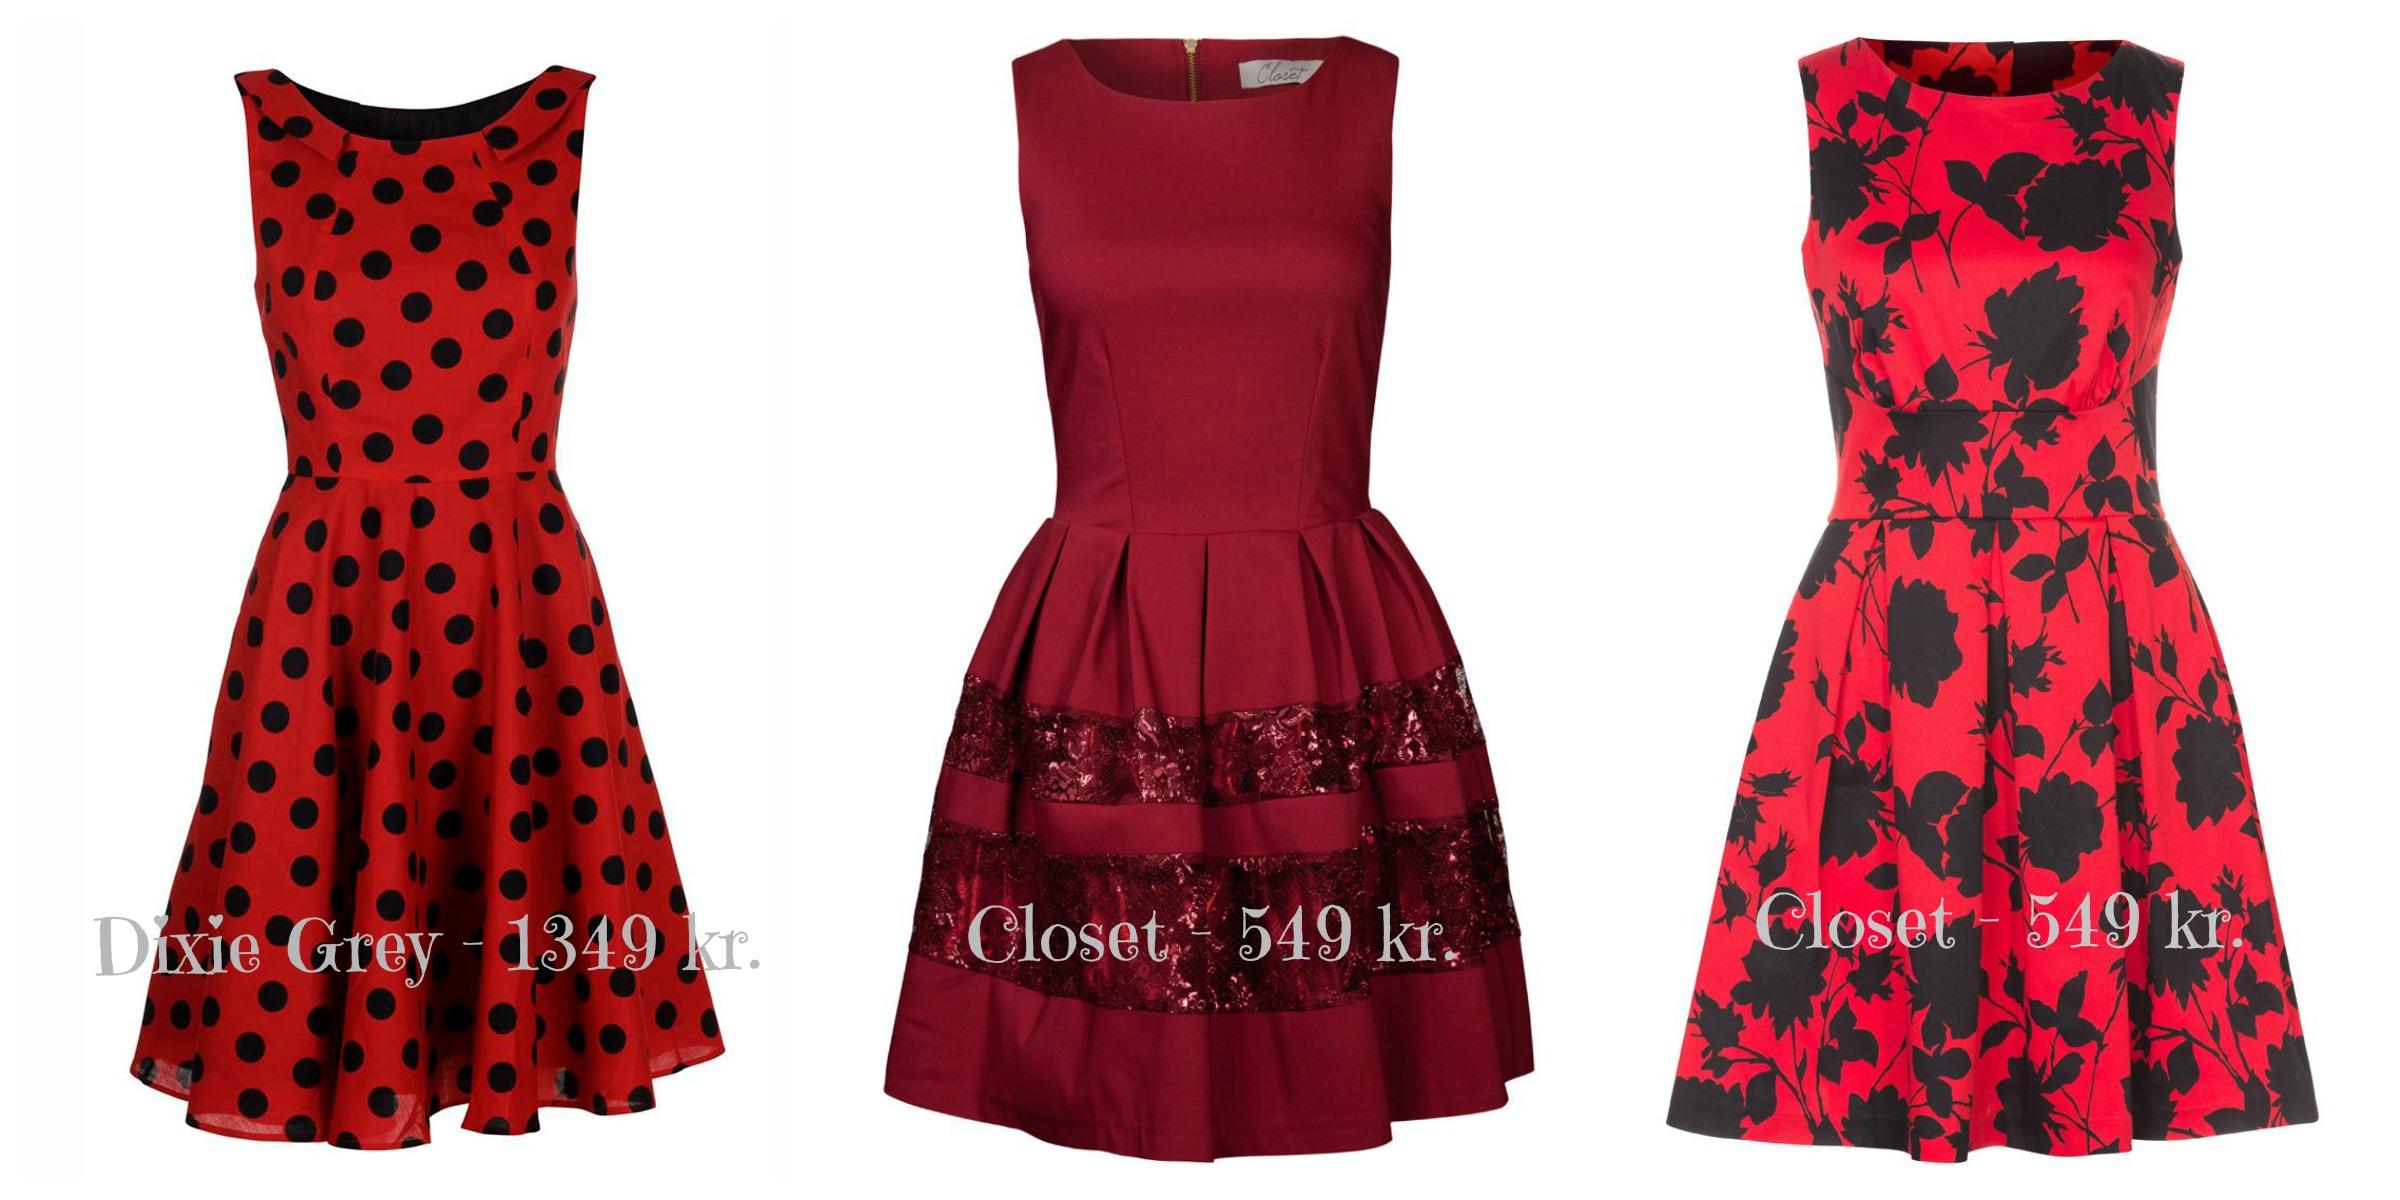 Røde kjoler med detaljer valentines day